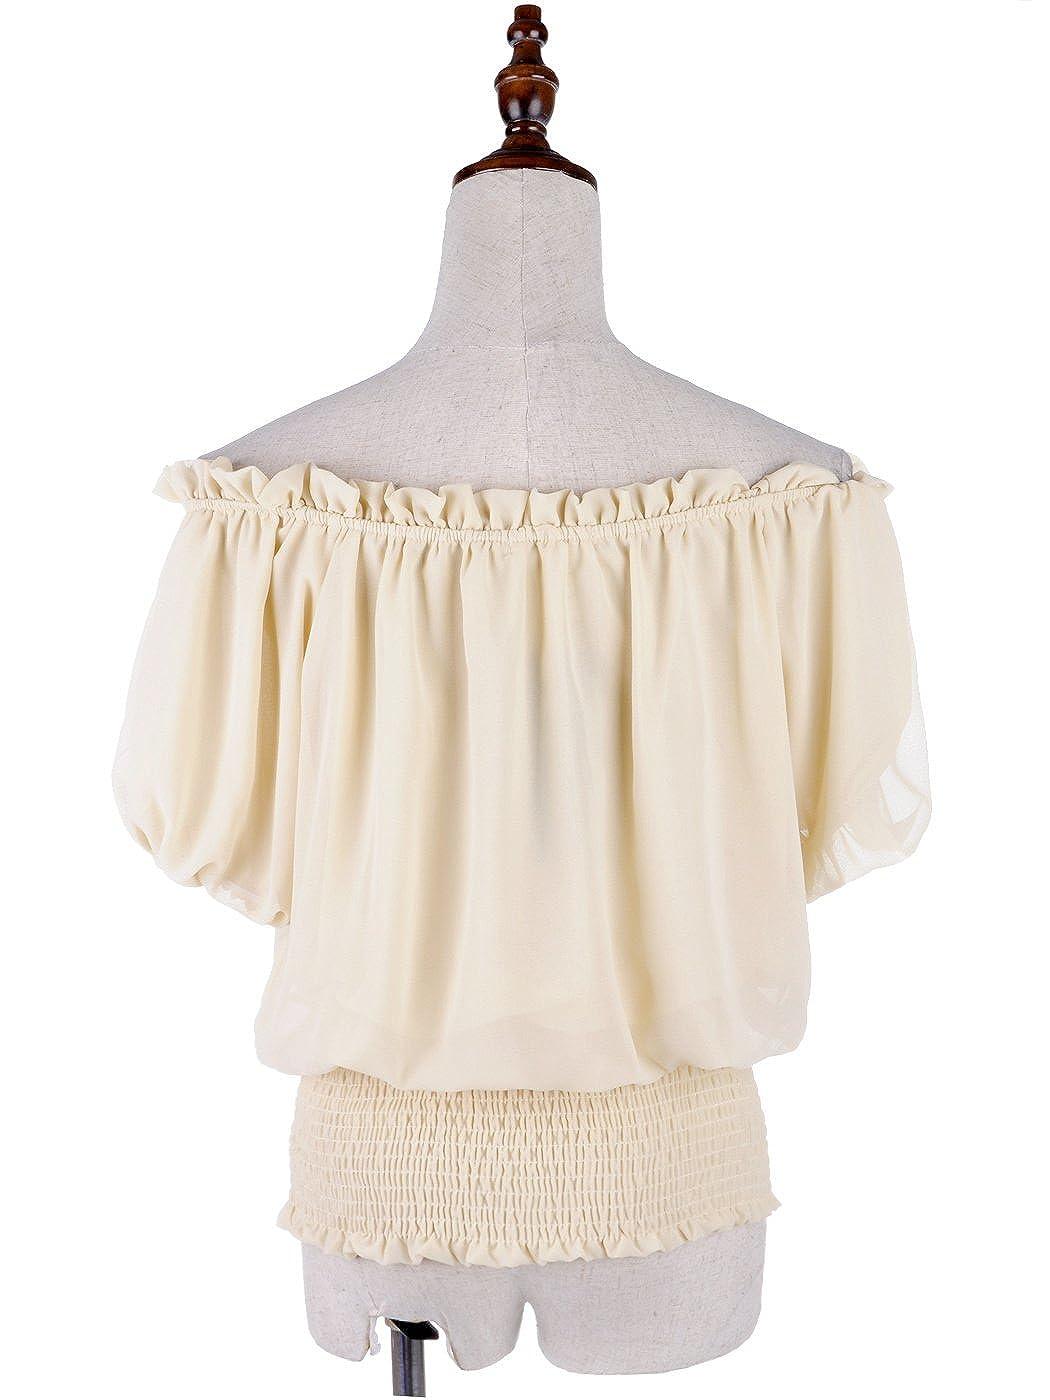 Anna-Kaci Camiseta de manga corta para volantes elástico Off hombro Boho blusa Top: Amazon.es: Ropa y accesorios